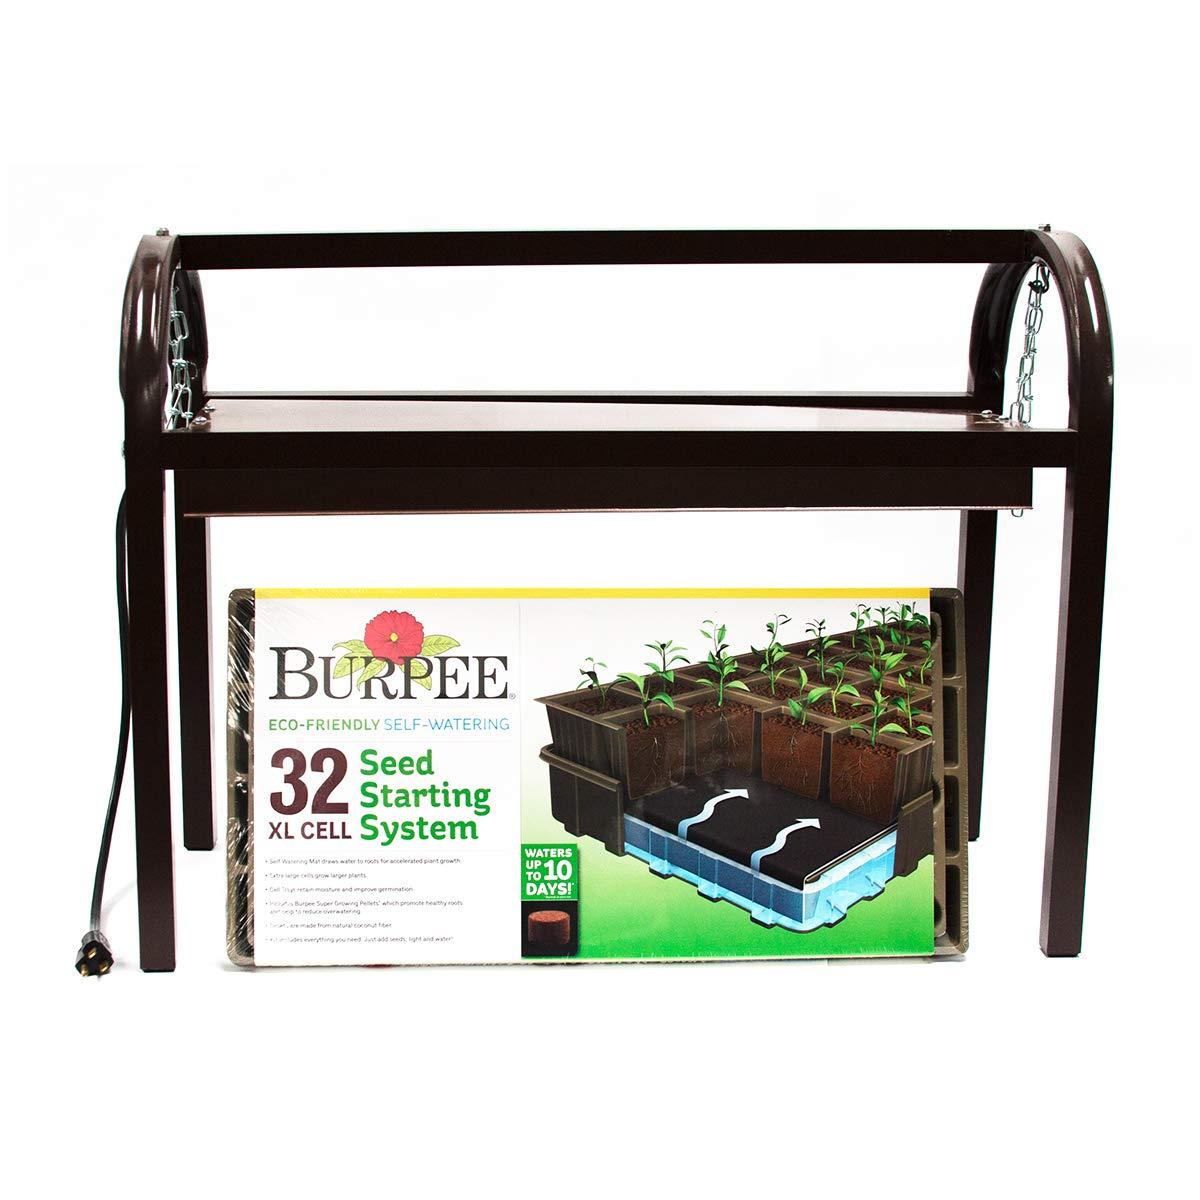 Burpee Exclusive Glow 'n Grow Tabletop Grow Light and Seed Starting Kit by Burpee